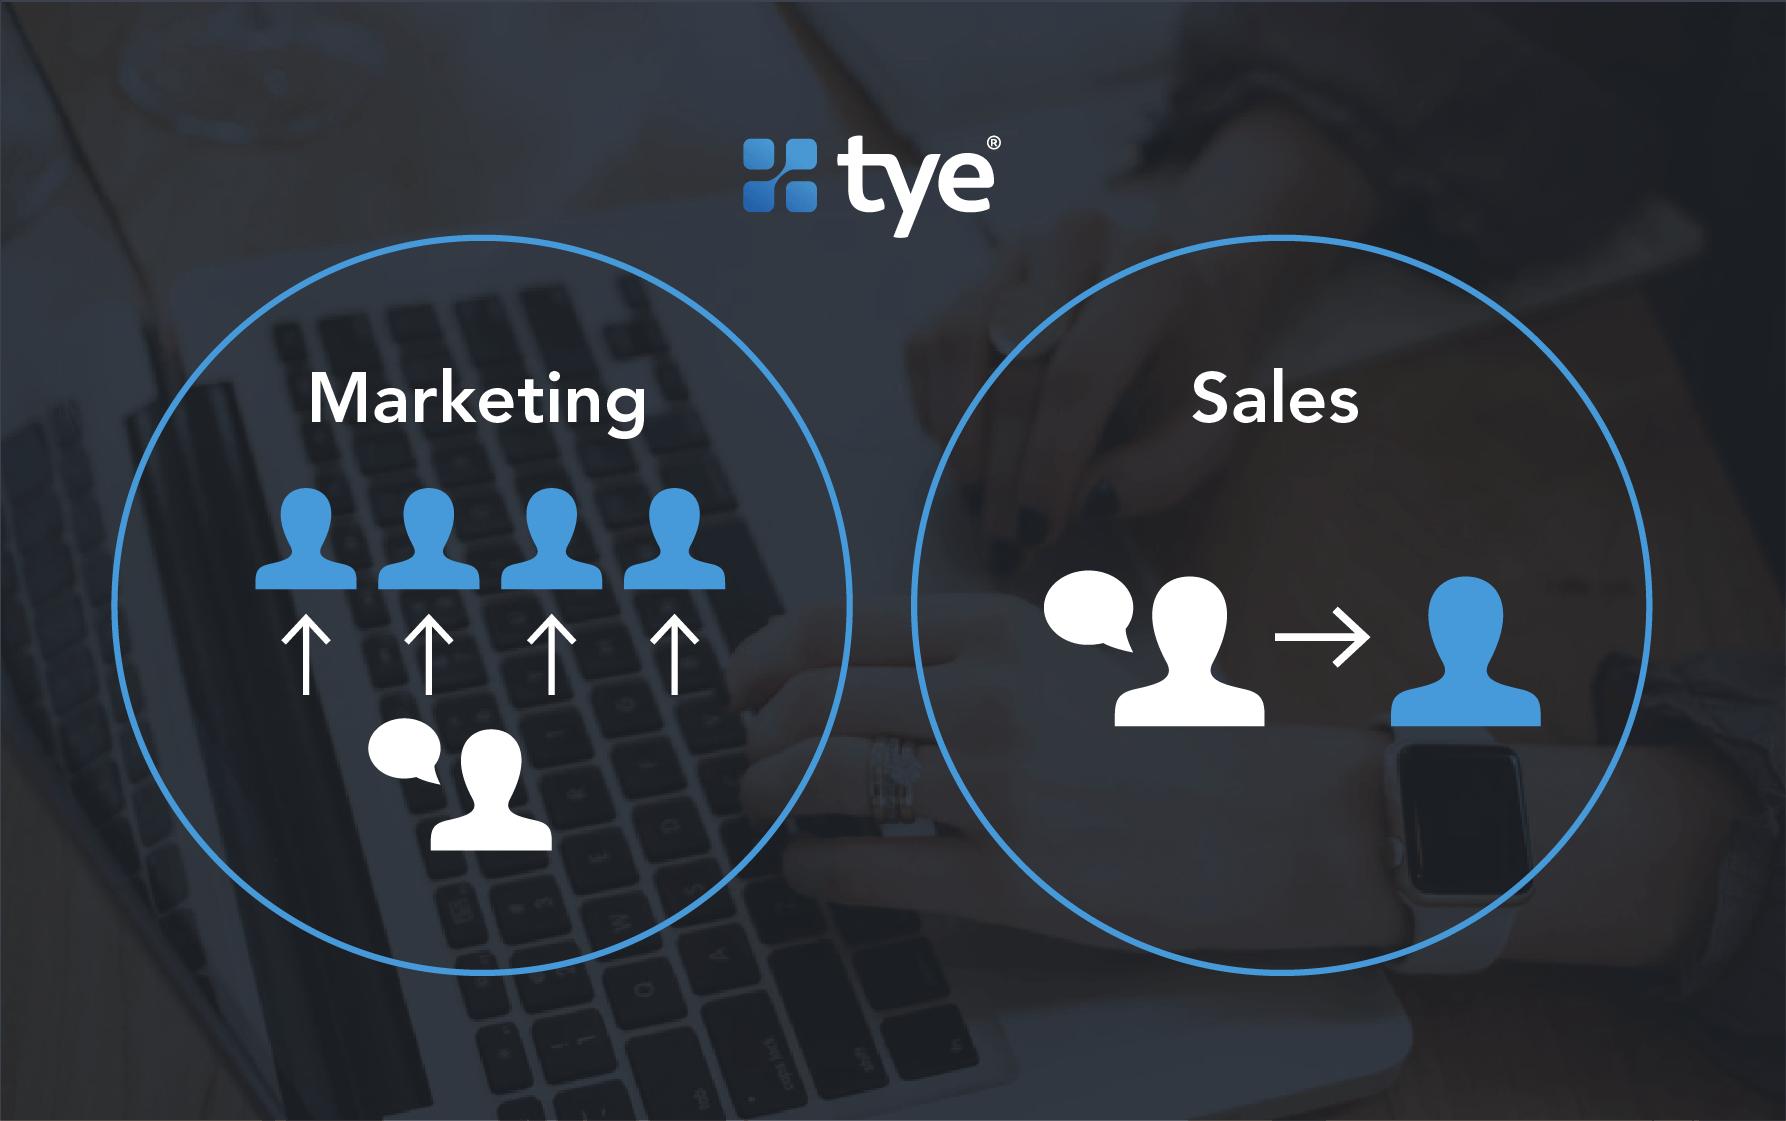 Image showing marketing vs. sales